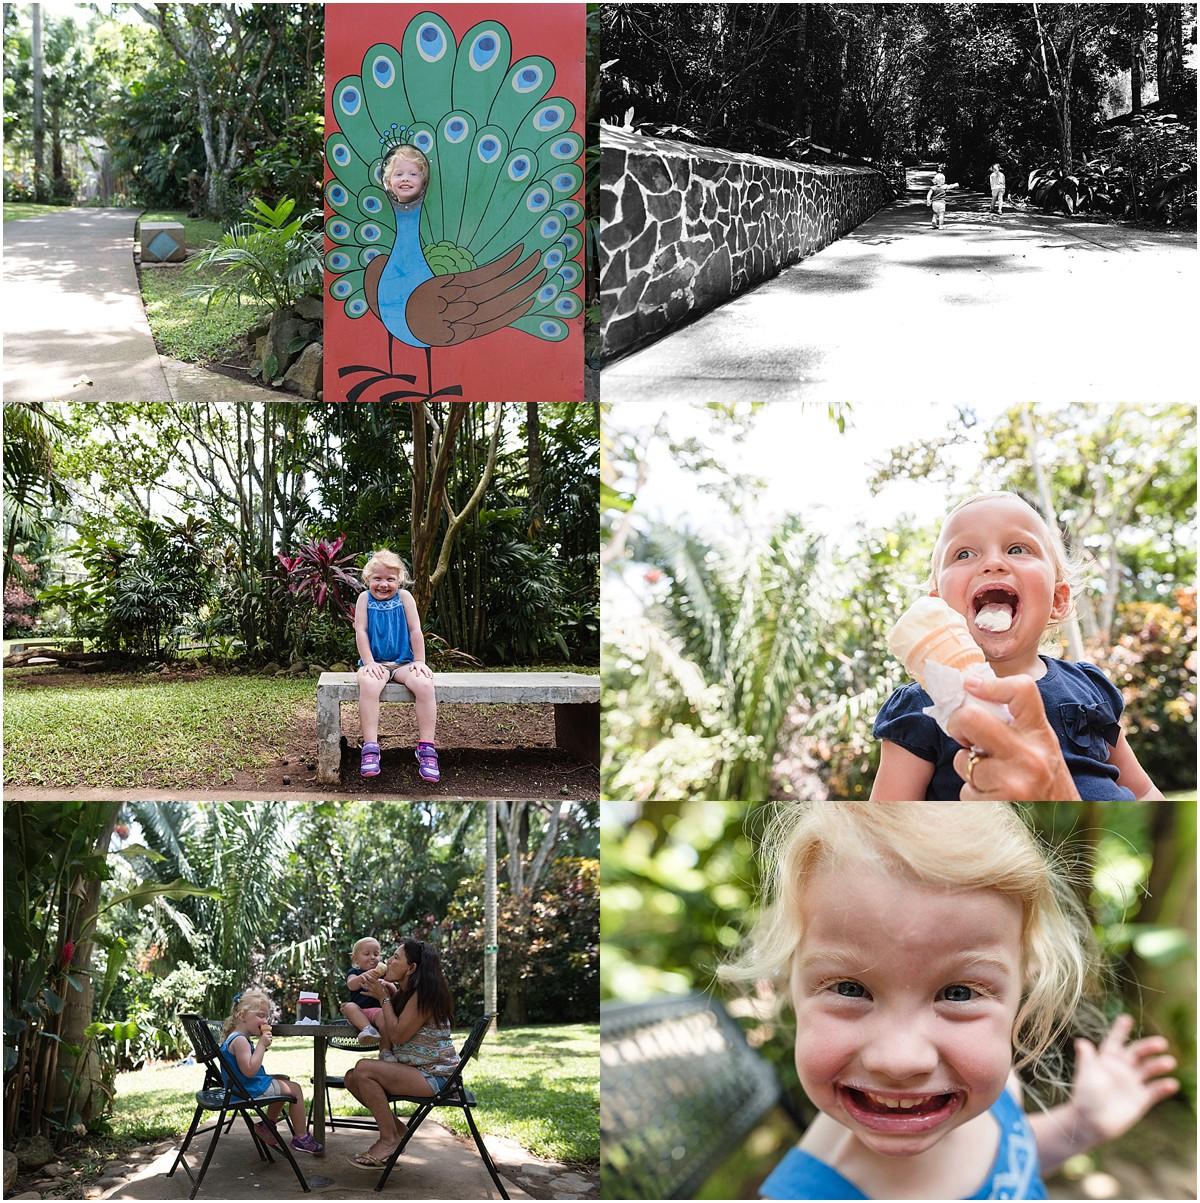 Ashley_Rogers_Photography_South_Florida_Photographer_Orlando_Photographer_Costa_Rica_Photographer_0919.jpg